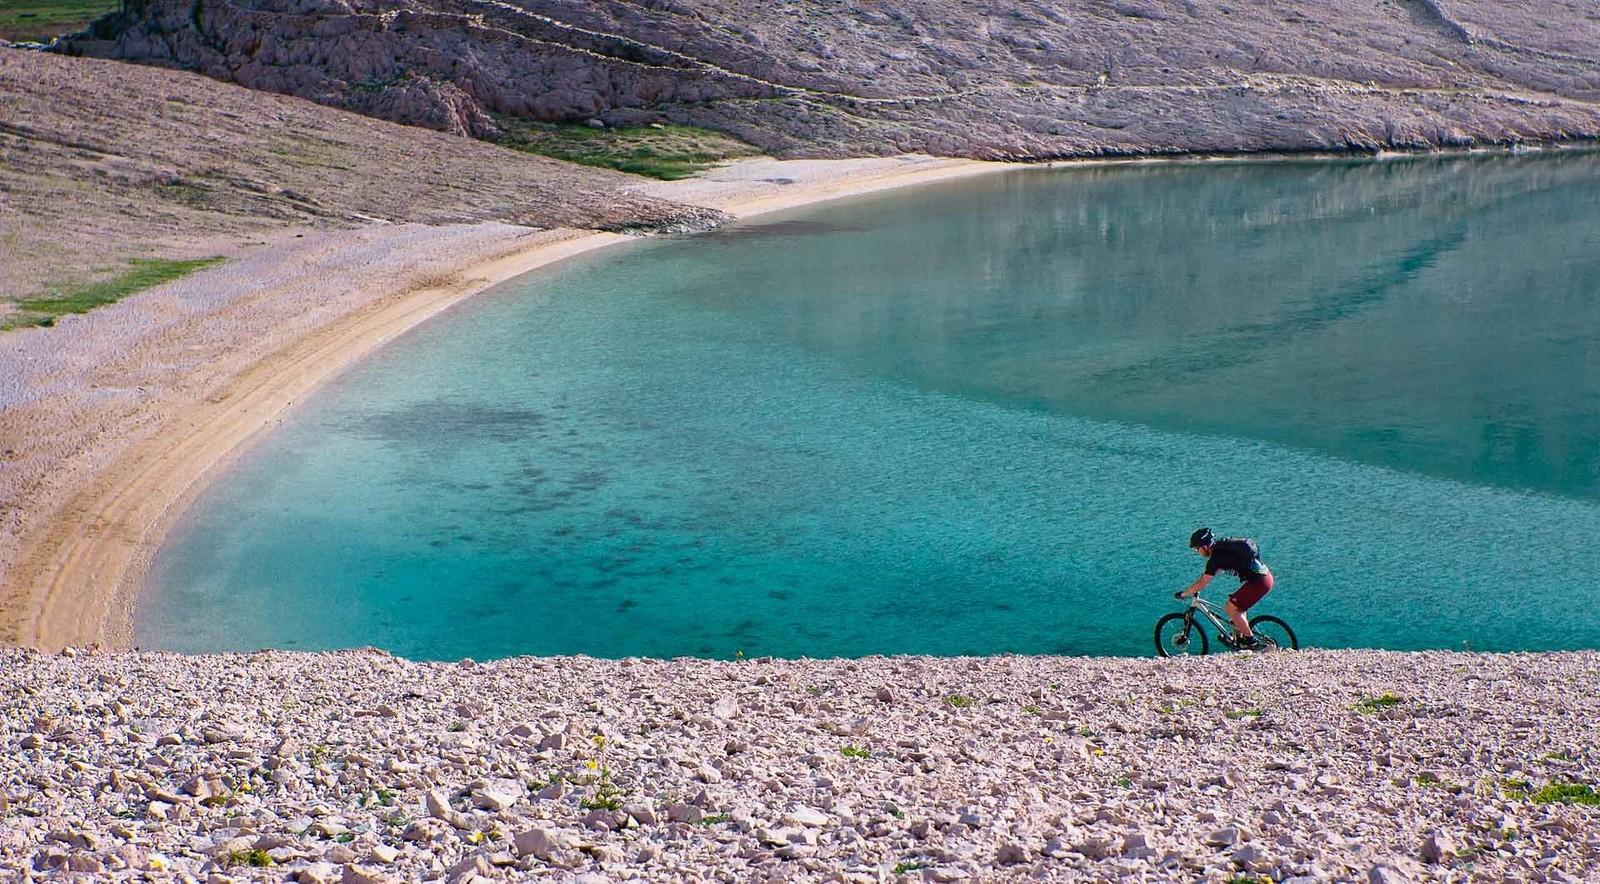 Croatian coast II - berto - Mountain Biking Pictures - Vital MTB